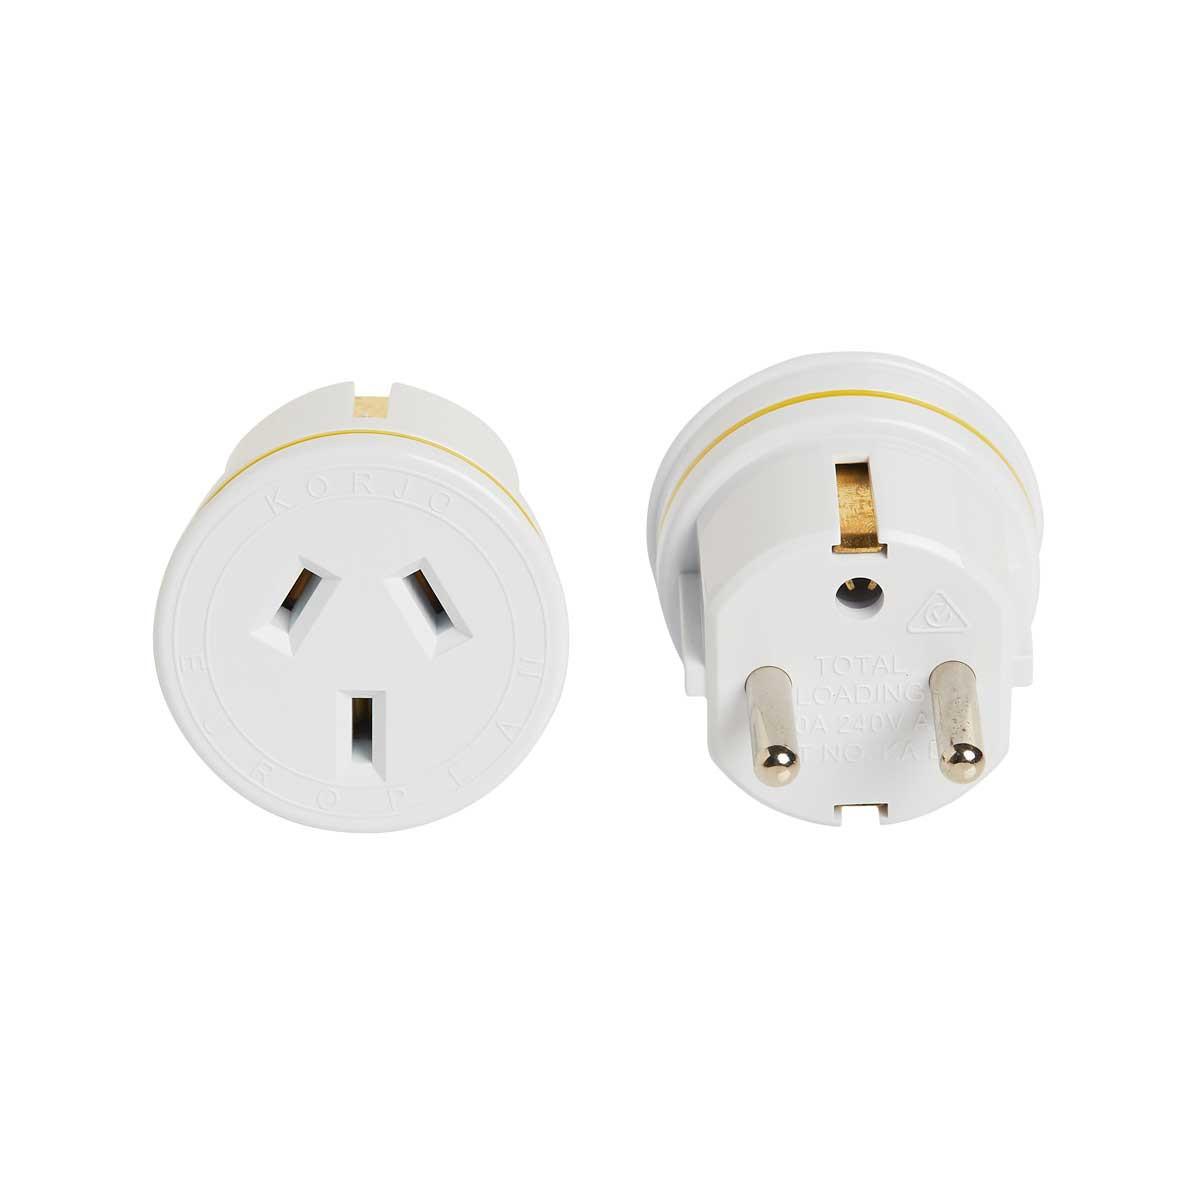 Korjo Electrical Adaptor: Australia and NZ -> Europe